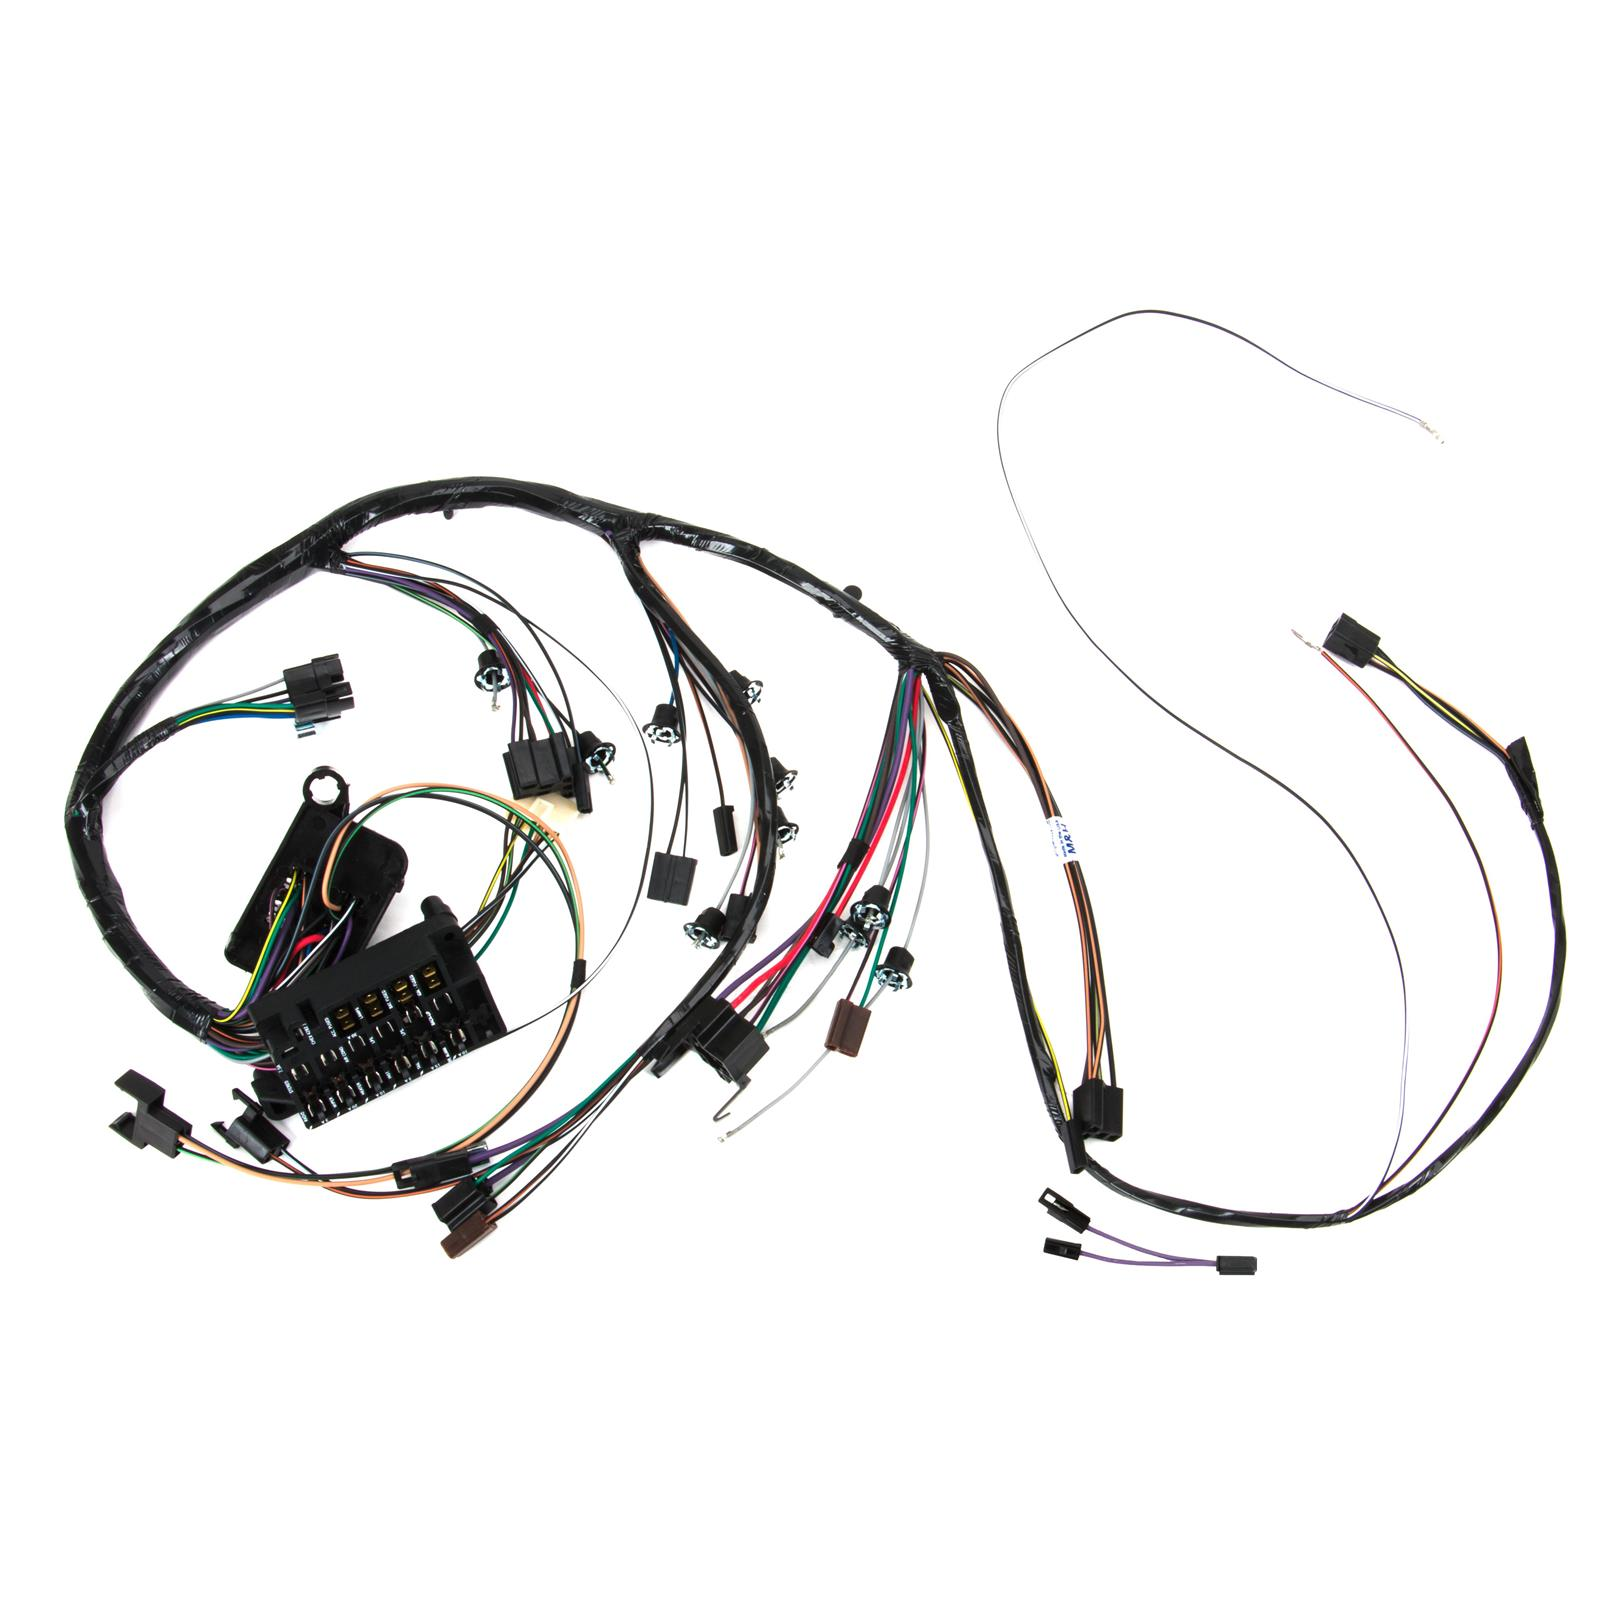 m h electric 10535 dash wiring harness w gauges 1967 chevelle Injectors Megasquirt Wiring 92621793 l1600 39ca3ecb c5fe 4844 9af9 f57a01e19ab8